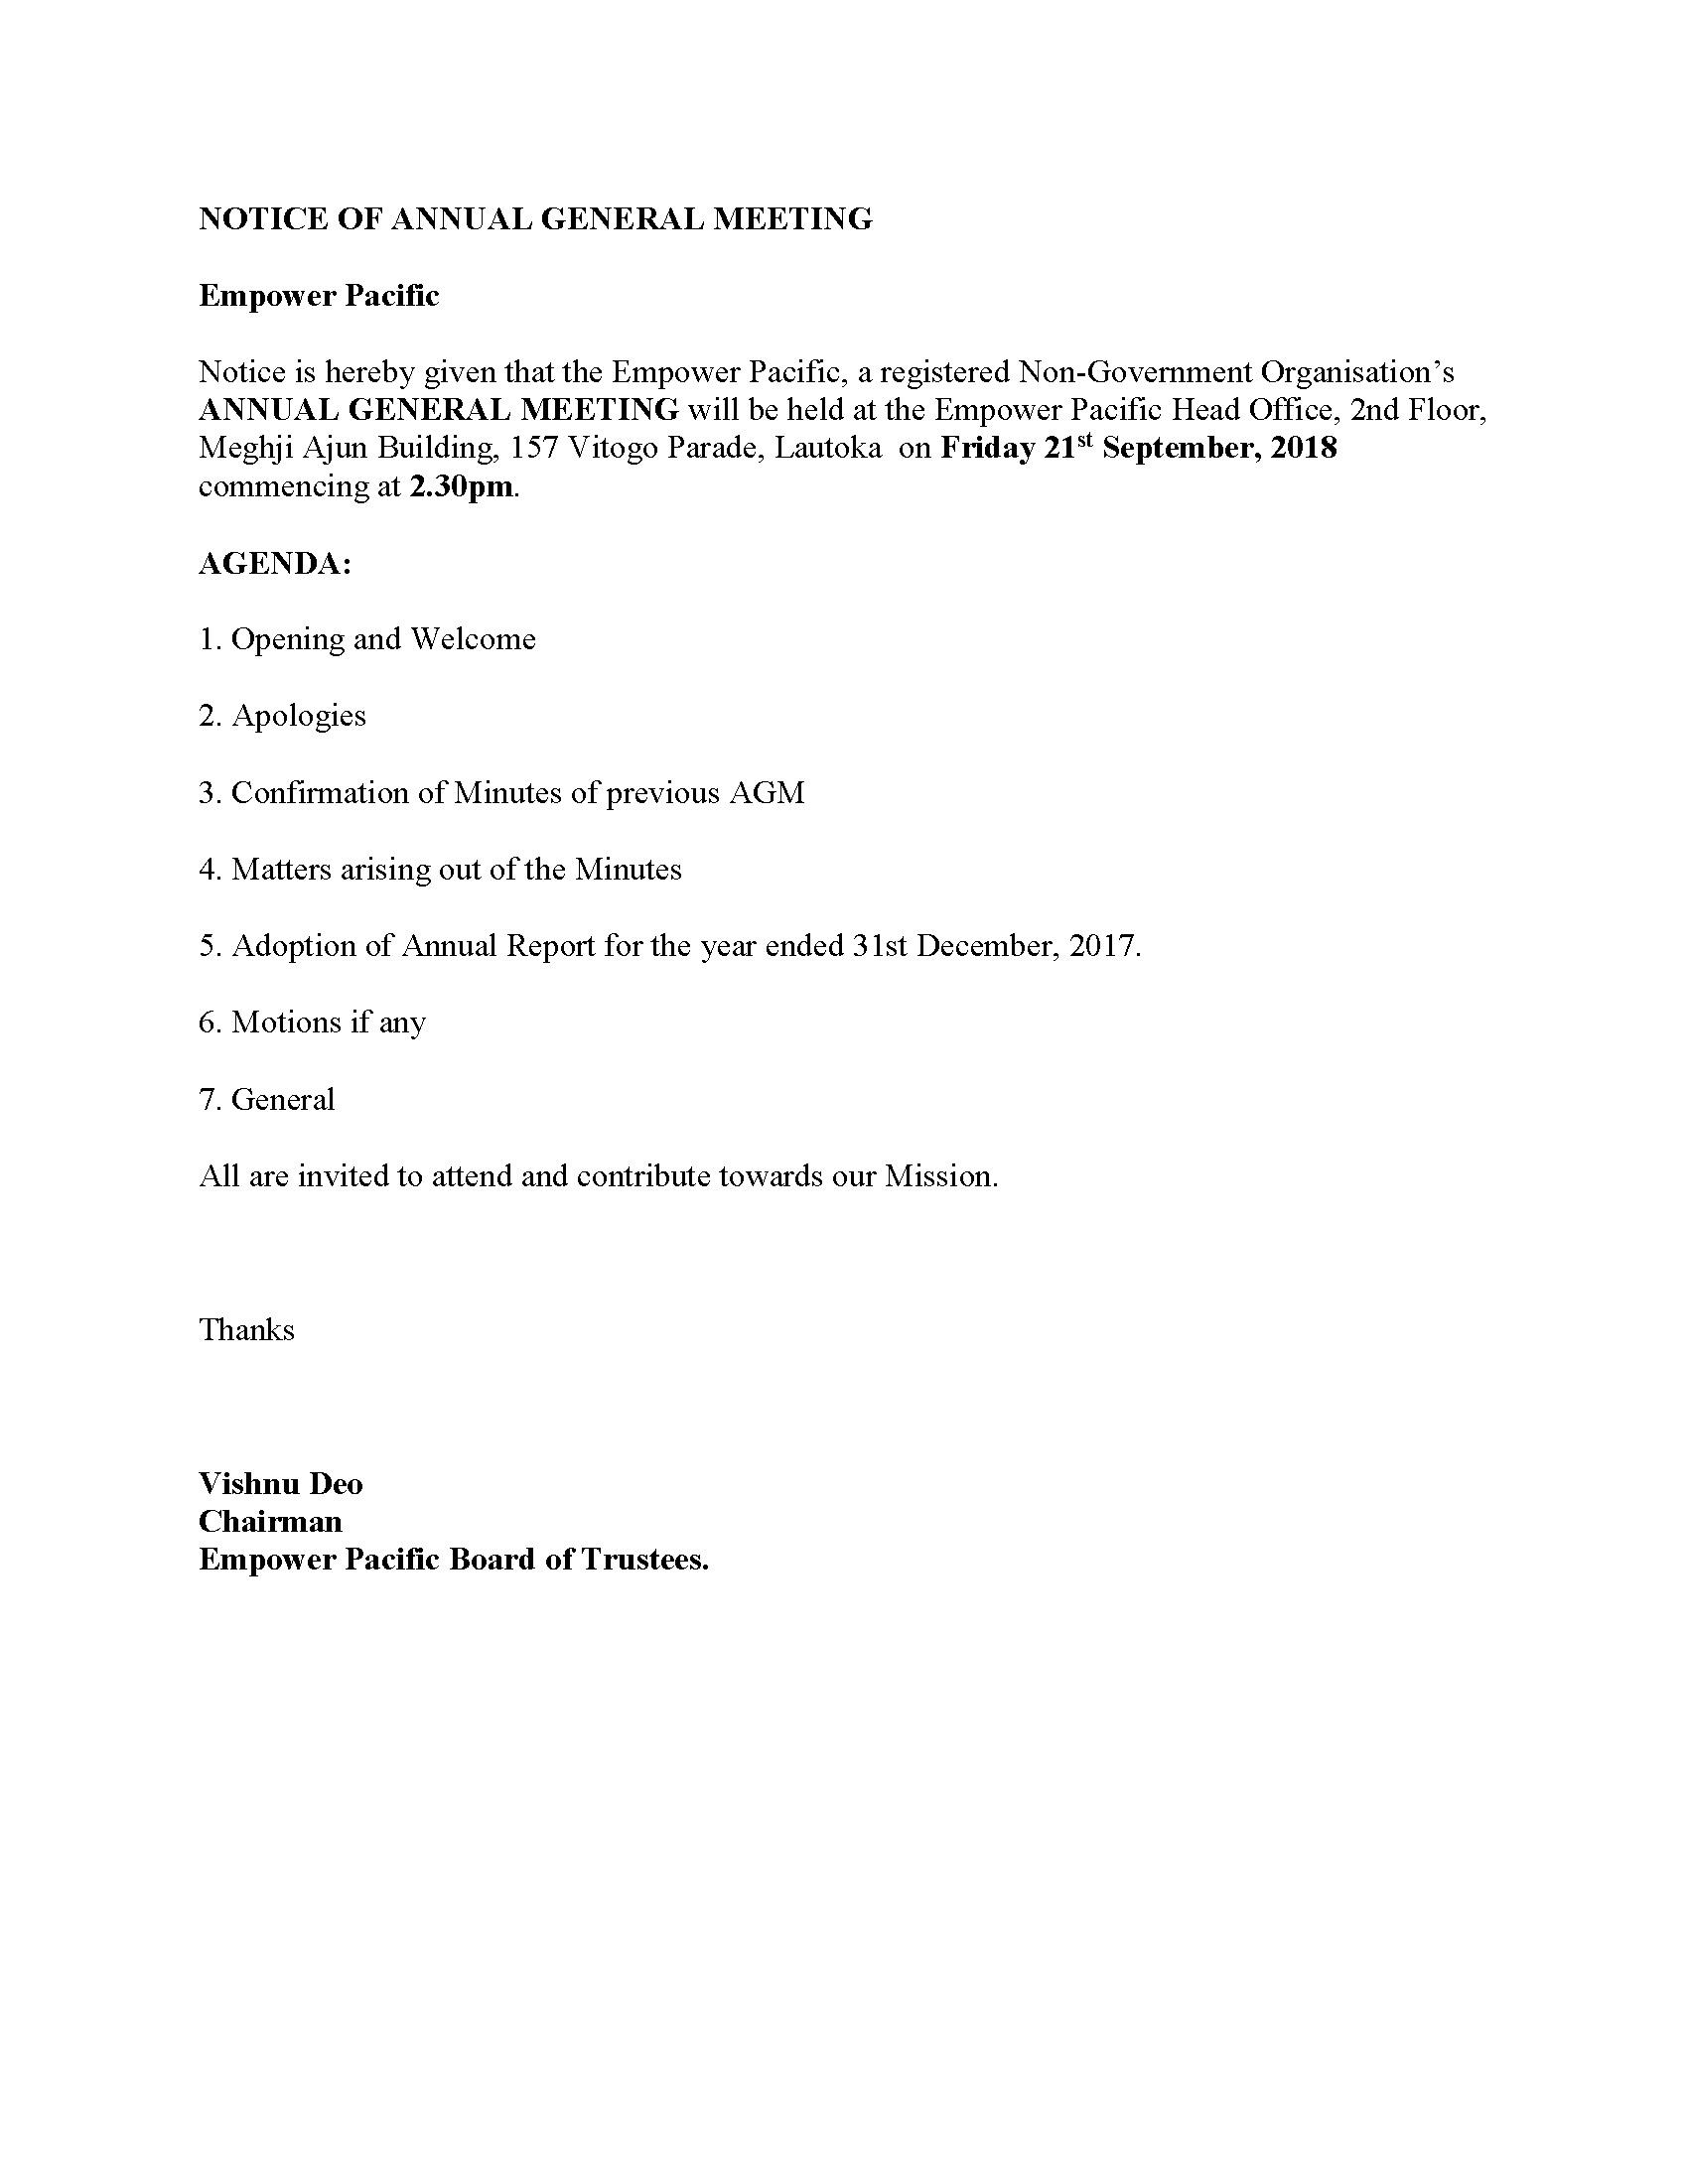 2018 NOTICE OF ANNUAL GENERAL MEETIN1.jpg